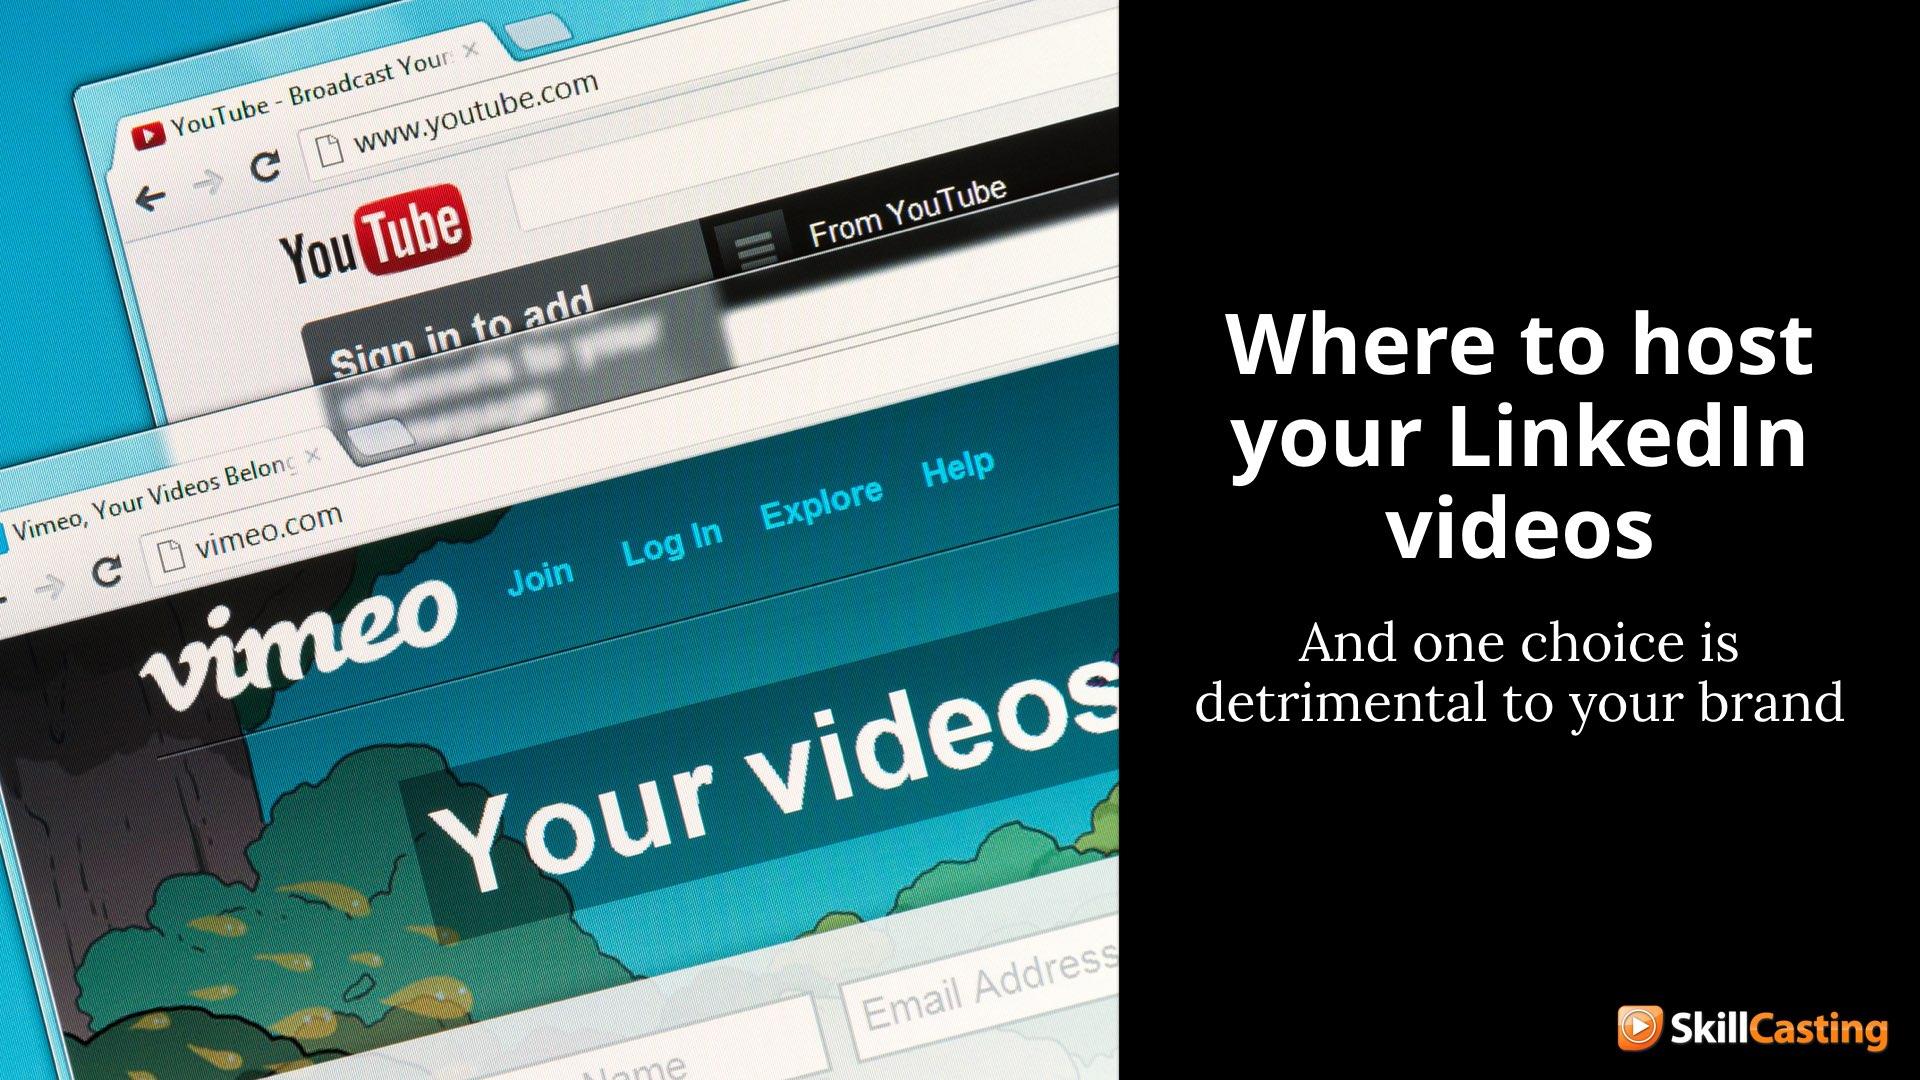 LinkedIn-video-hosting-thumbnail.001.jpeg